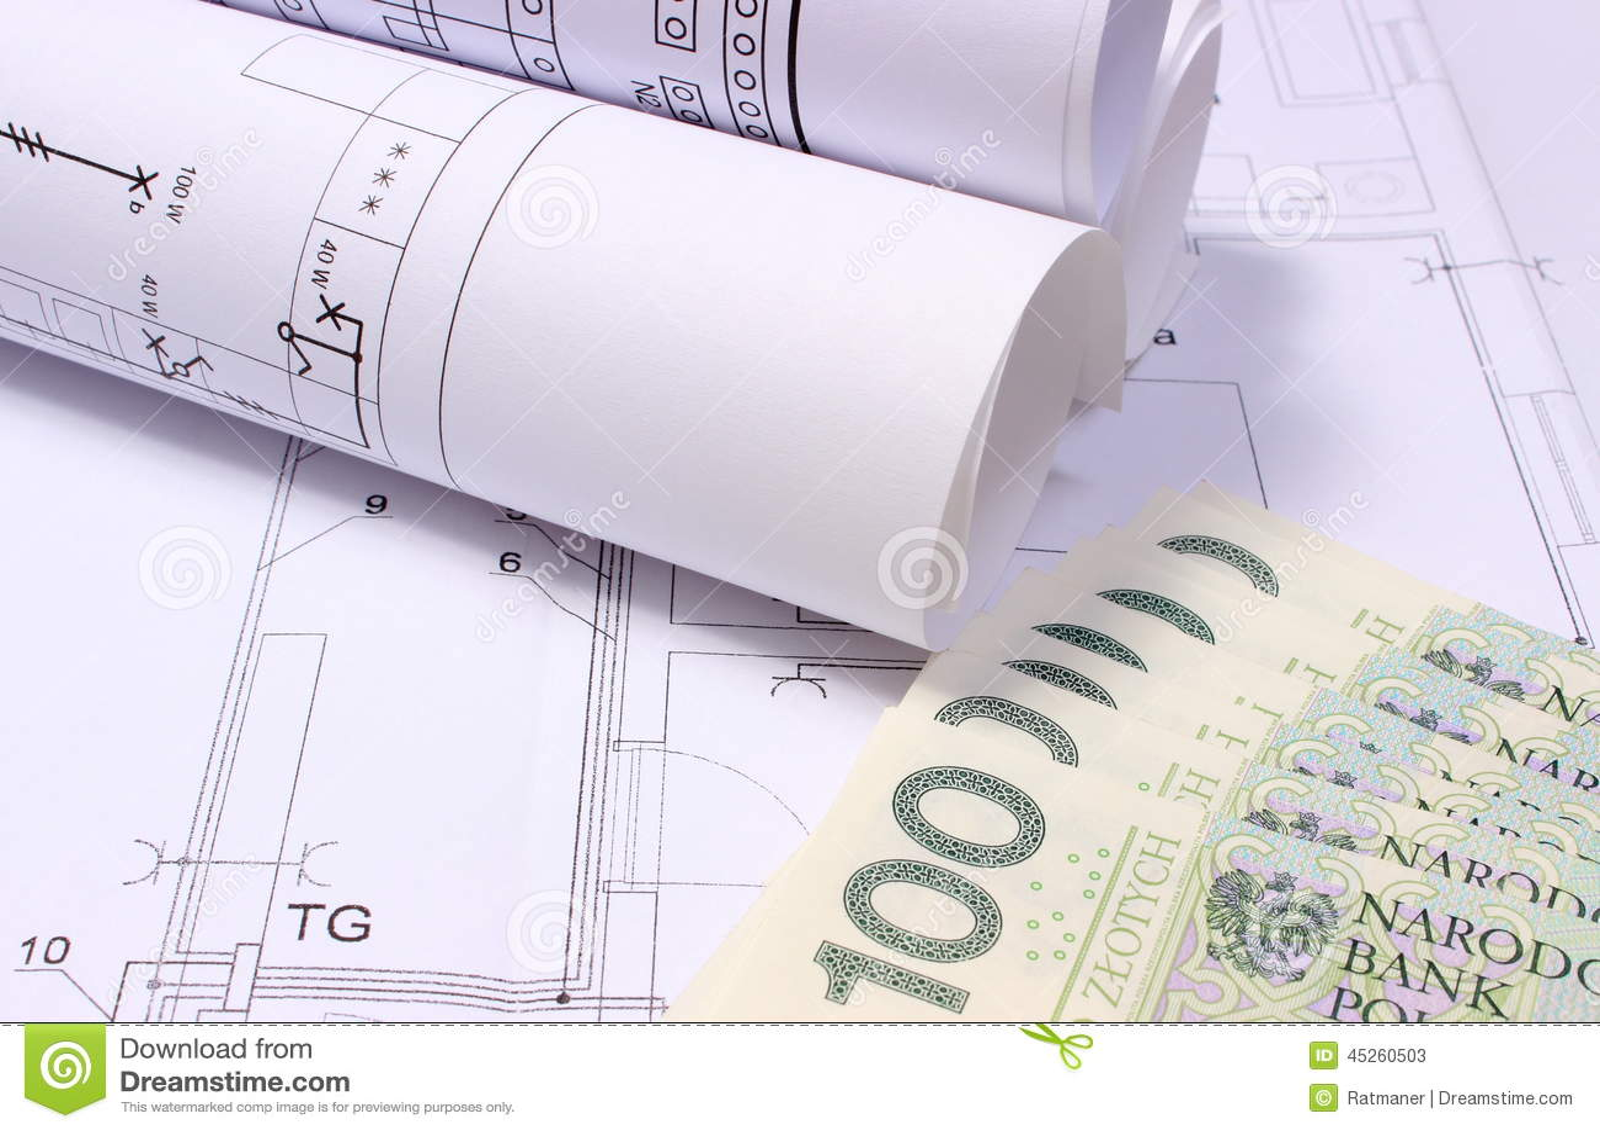 house diagrams] capithetical architecture diagram study diagram ...